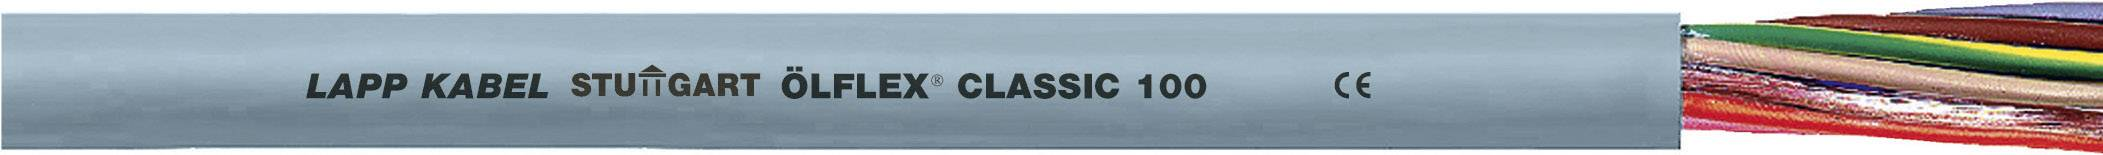 Kabel LappKabel Ölflex CLASSIC 100 4G4 (00101013), PVC, 12,5 mm, 750 V, šedá, 500 m